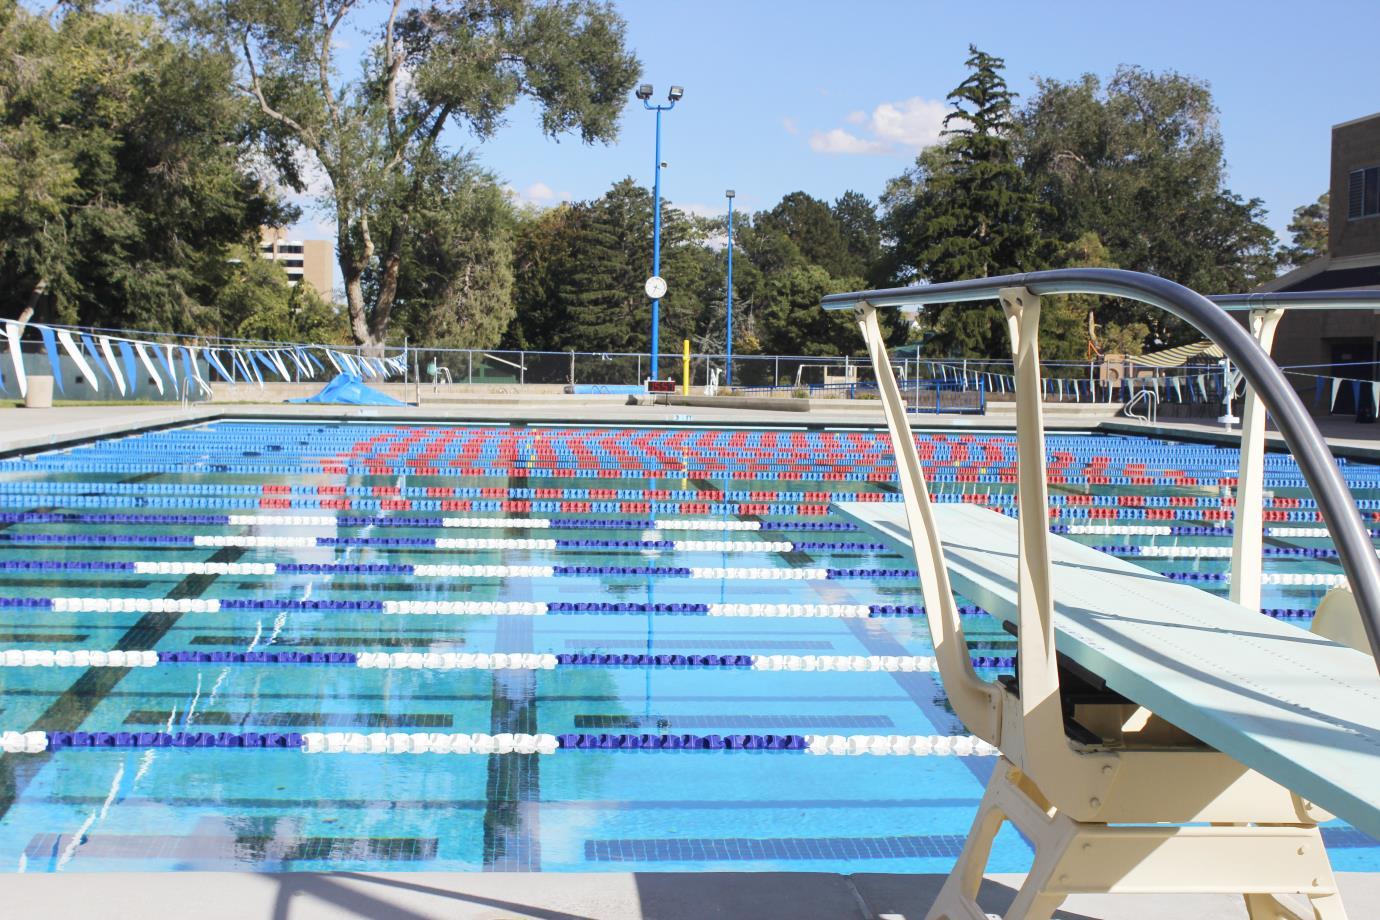 Idlewild Pool